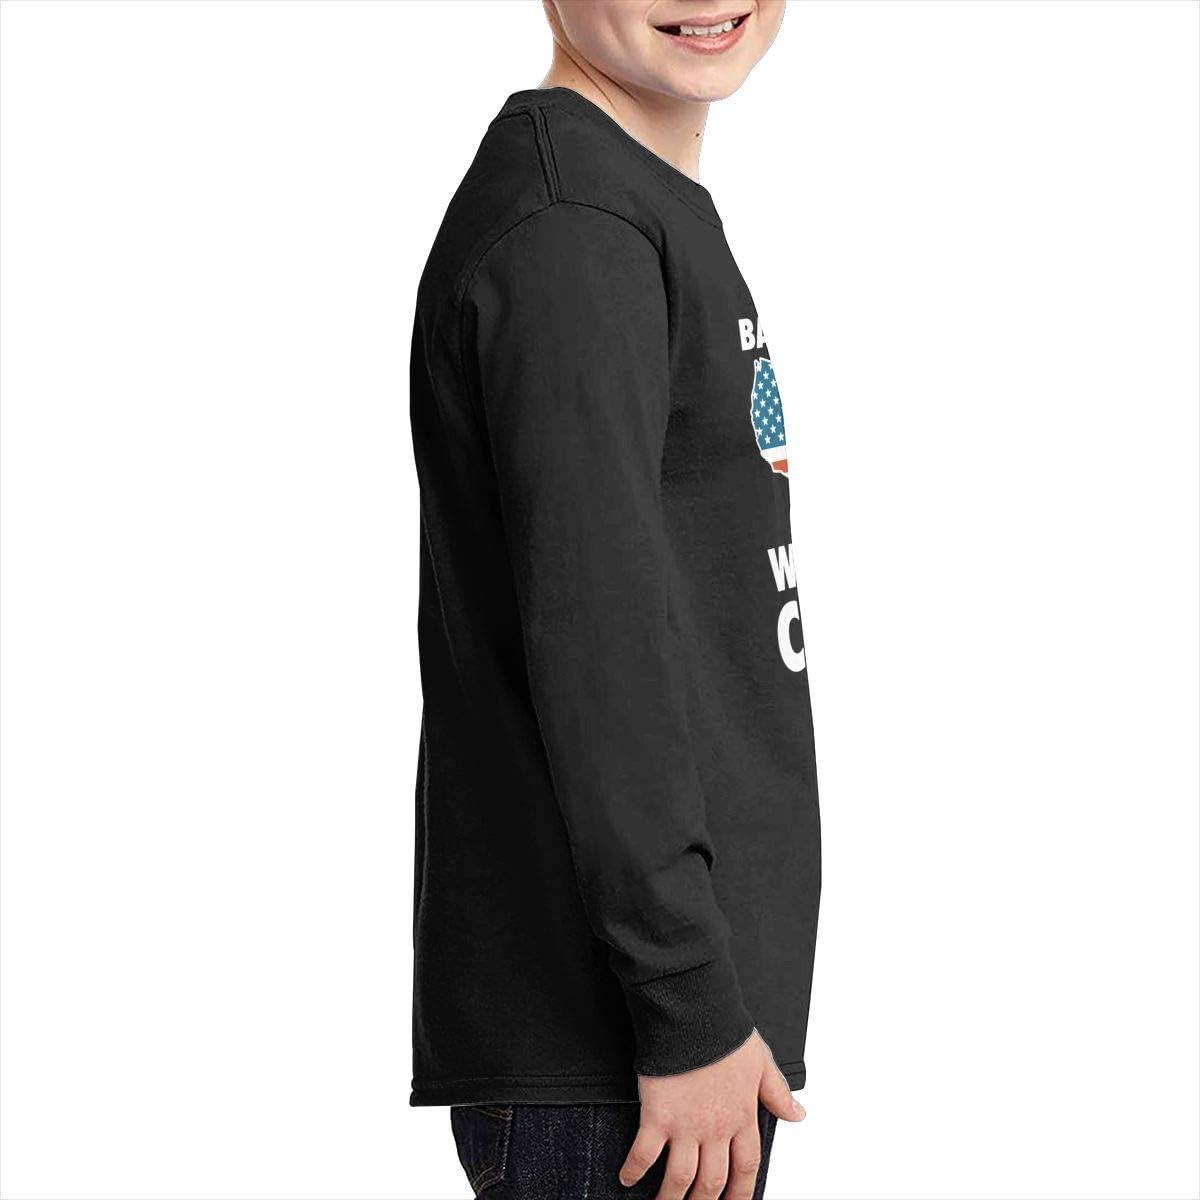 ZHAN-pcc Youth Back to Back World War Champs Fashion Long Sleeve Crewneck T Shirts Jersey Black